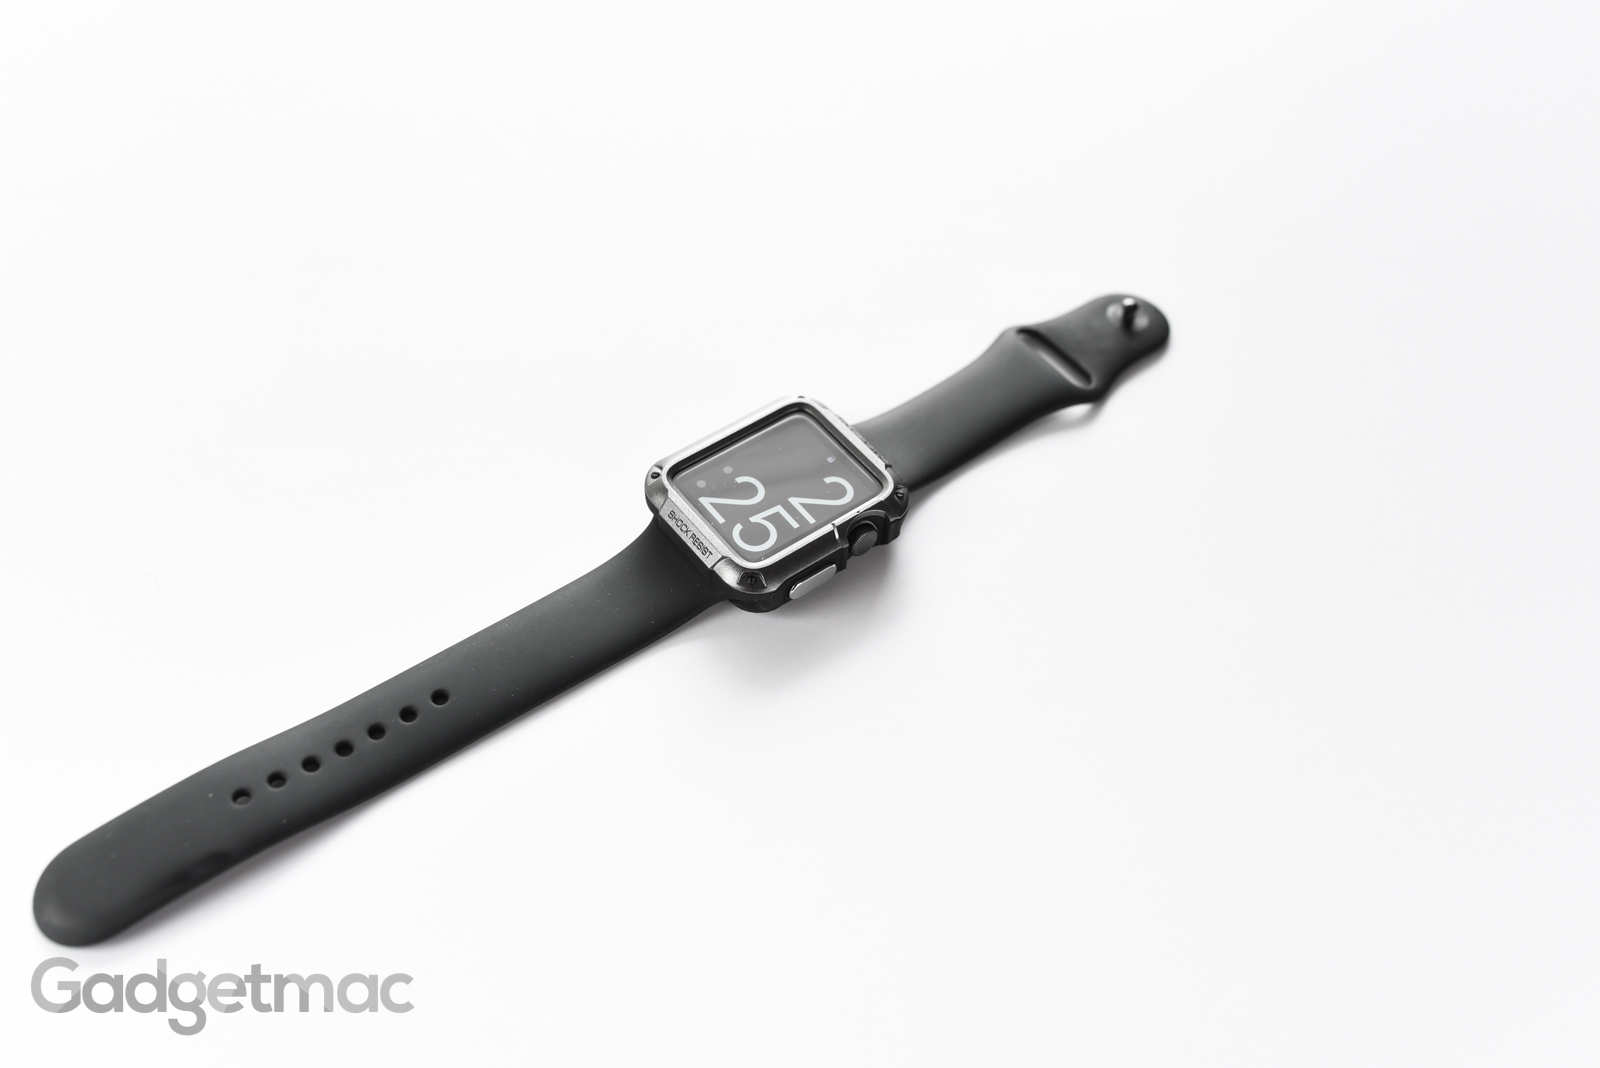 spigen-apple-watch-tough-armor-case-with-built-in-screen-protector-gunmetal.jpg